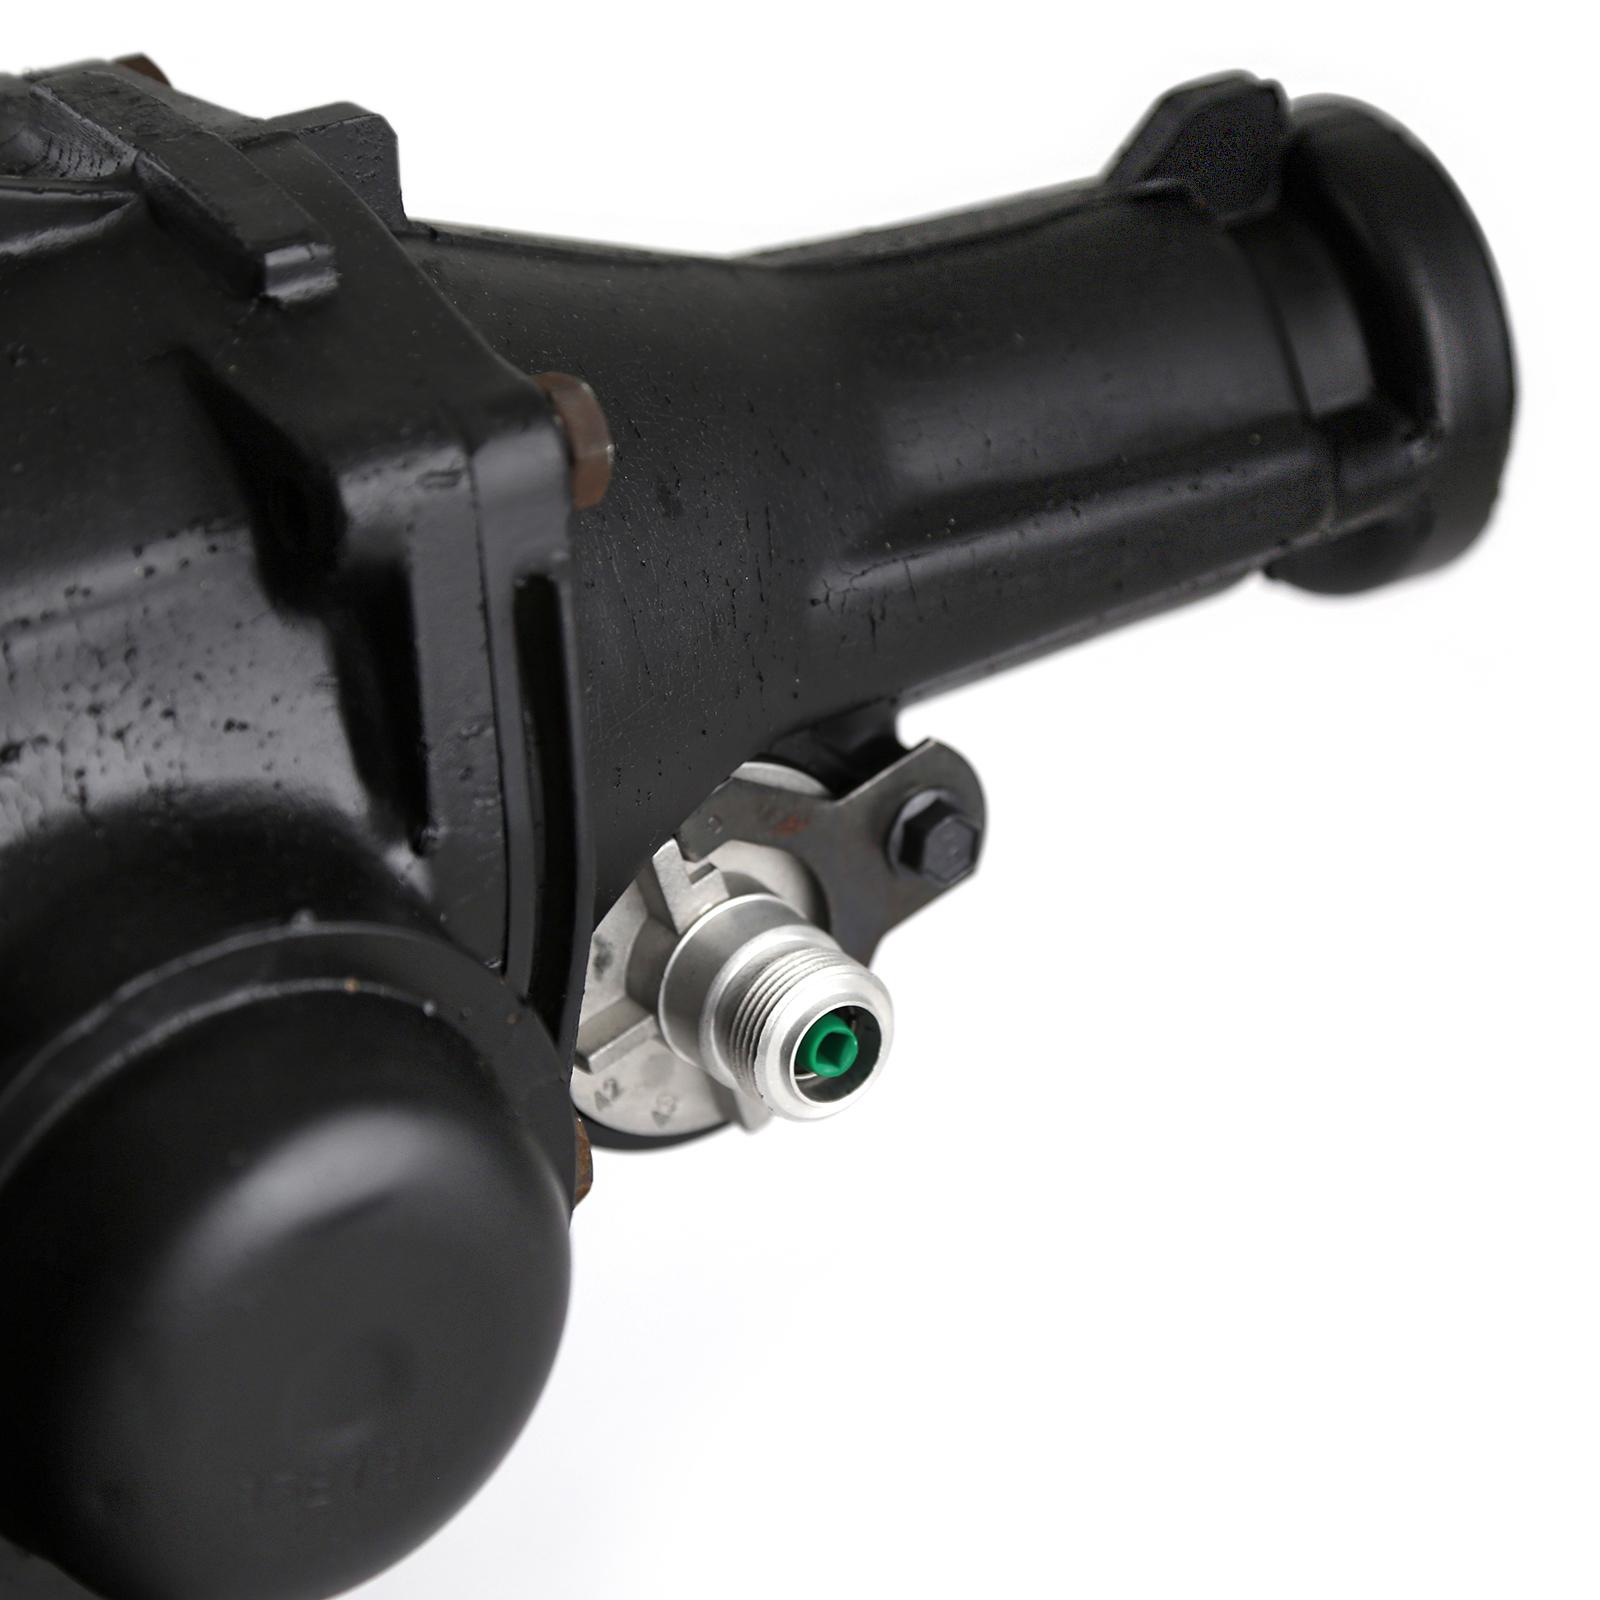 Turbo 400 Th400 Muscle Car Gm Performance Rebuilt Transmission